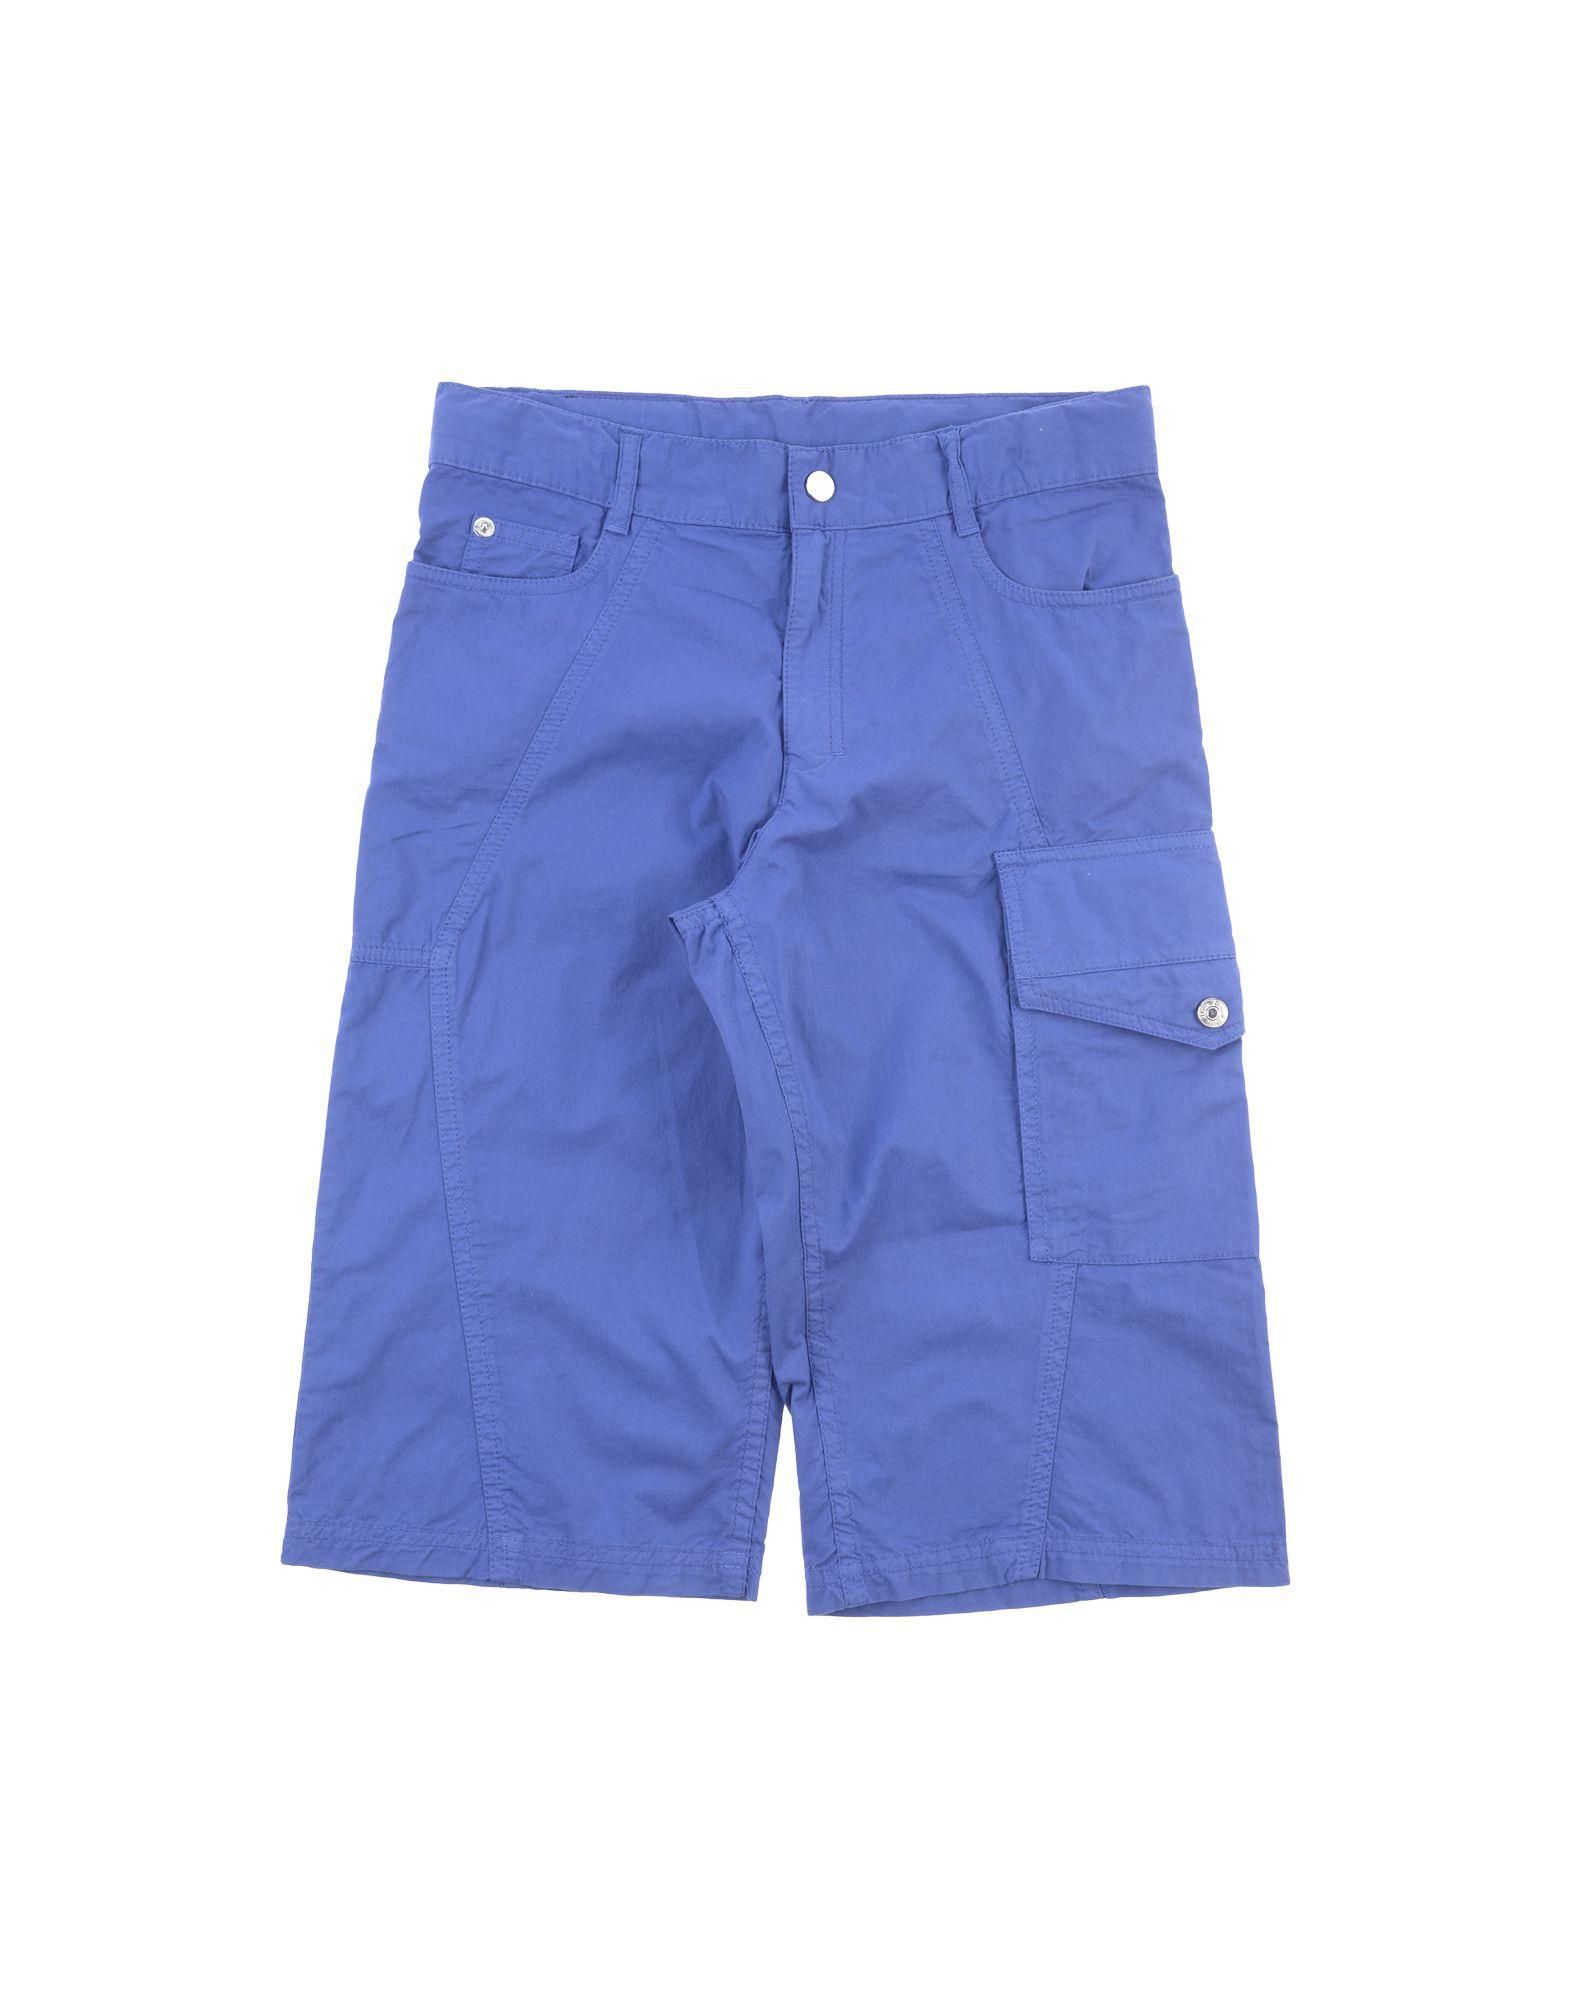 BABY DIOR Бермуды baby dior лыжные брюки